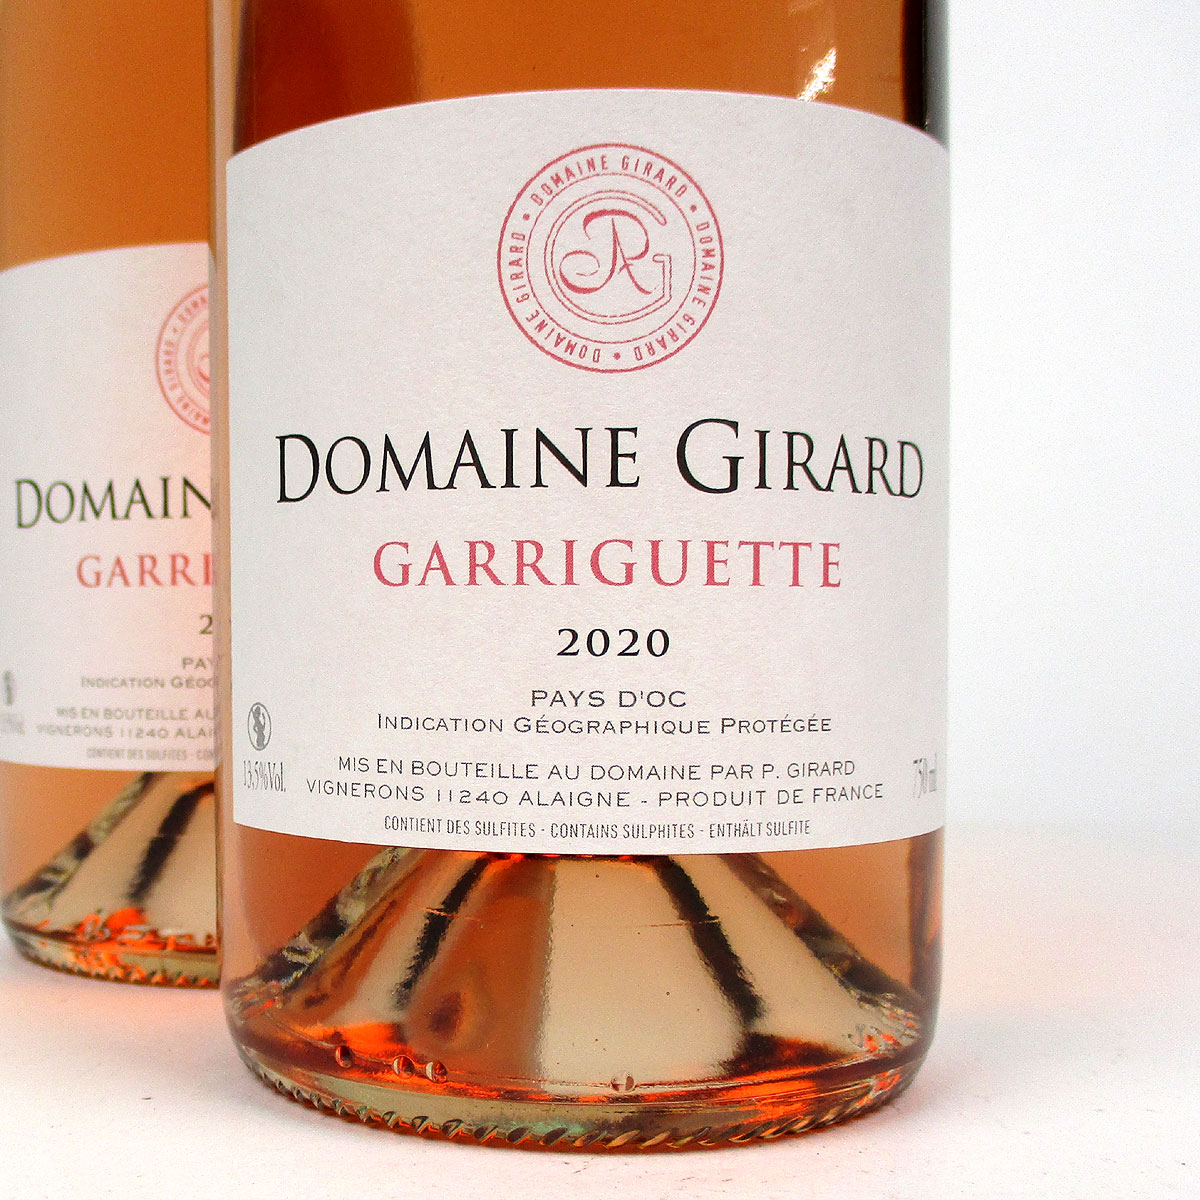 IGP Pays d'Oc: Domaine Girard 'Garriguette' Rosé 2020